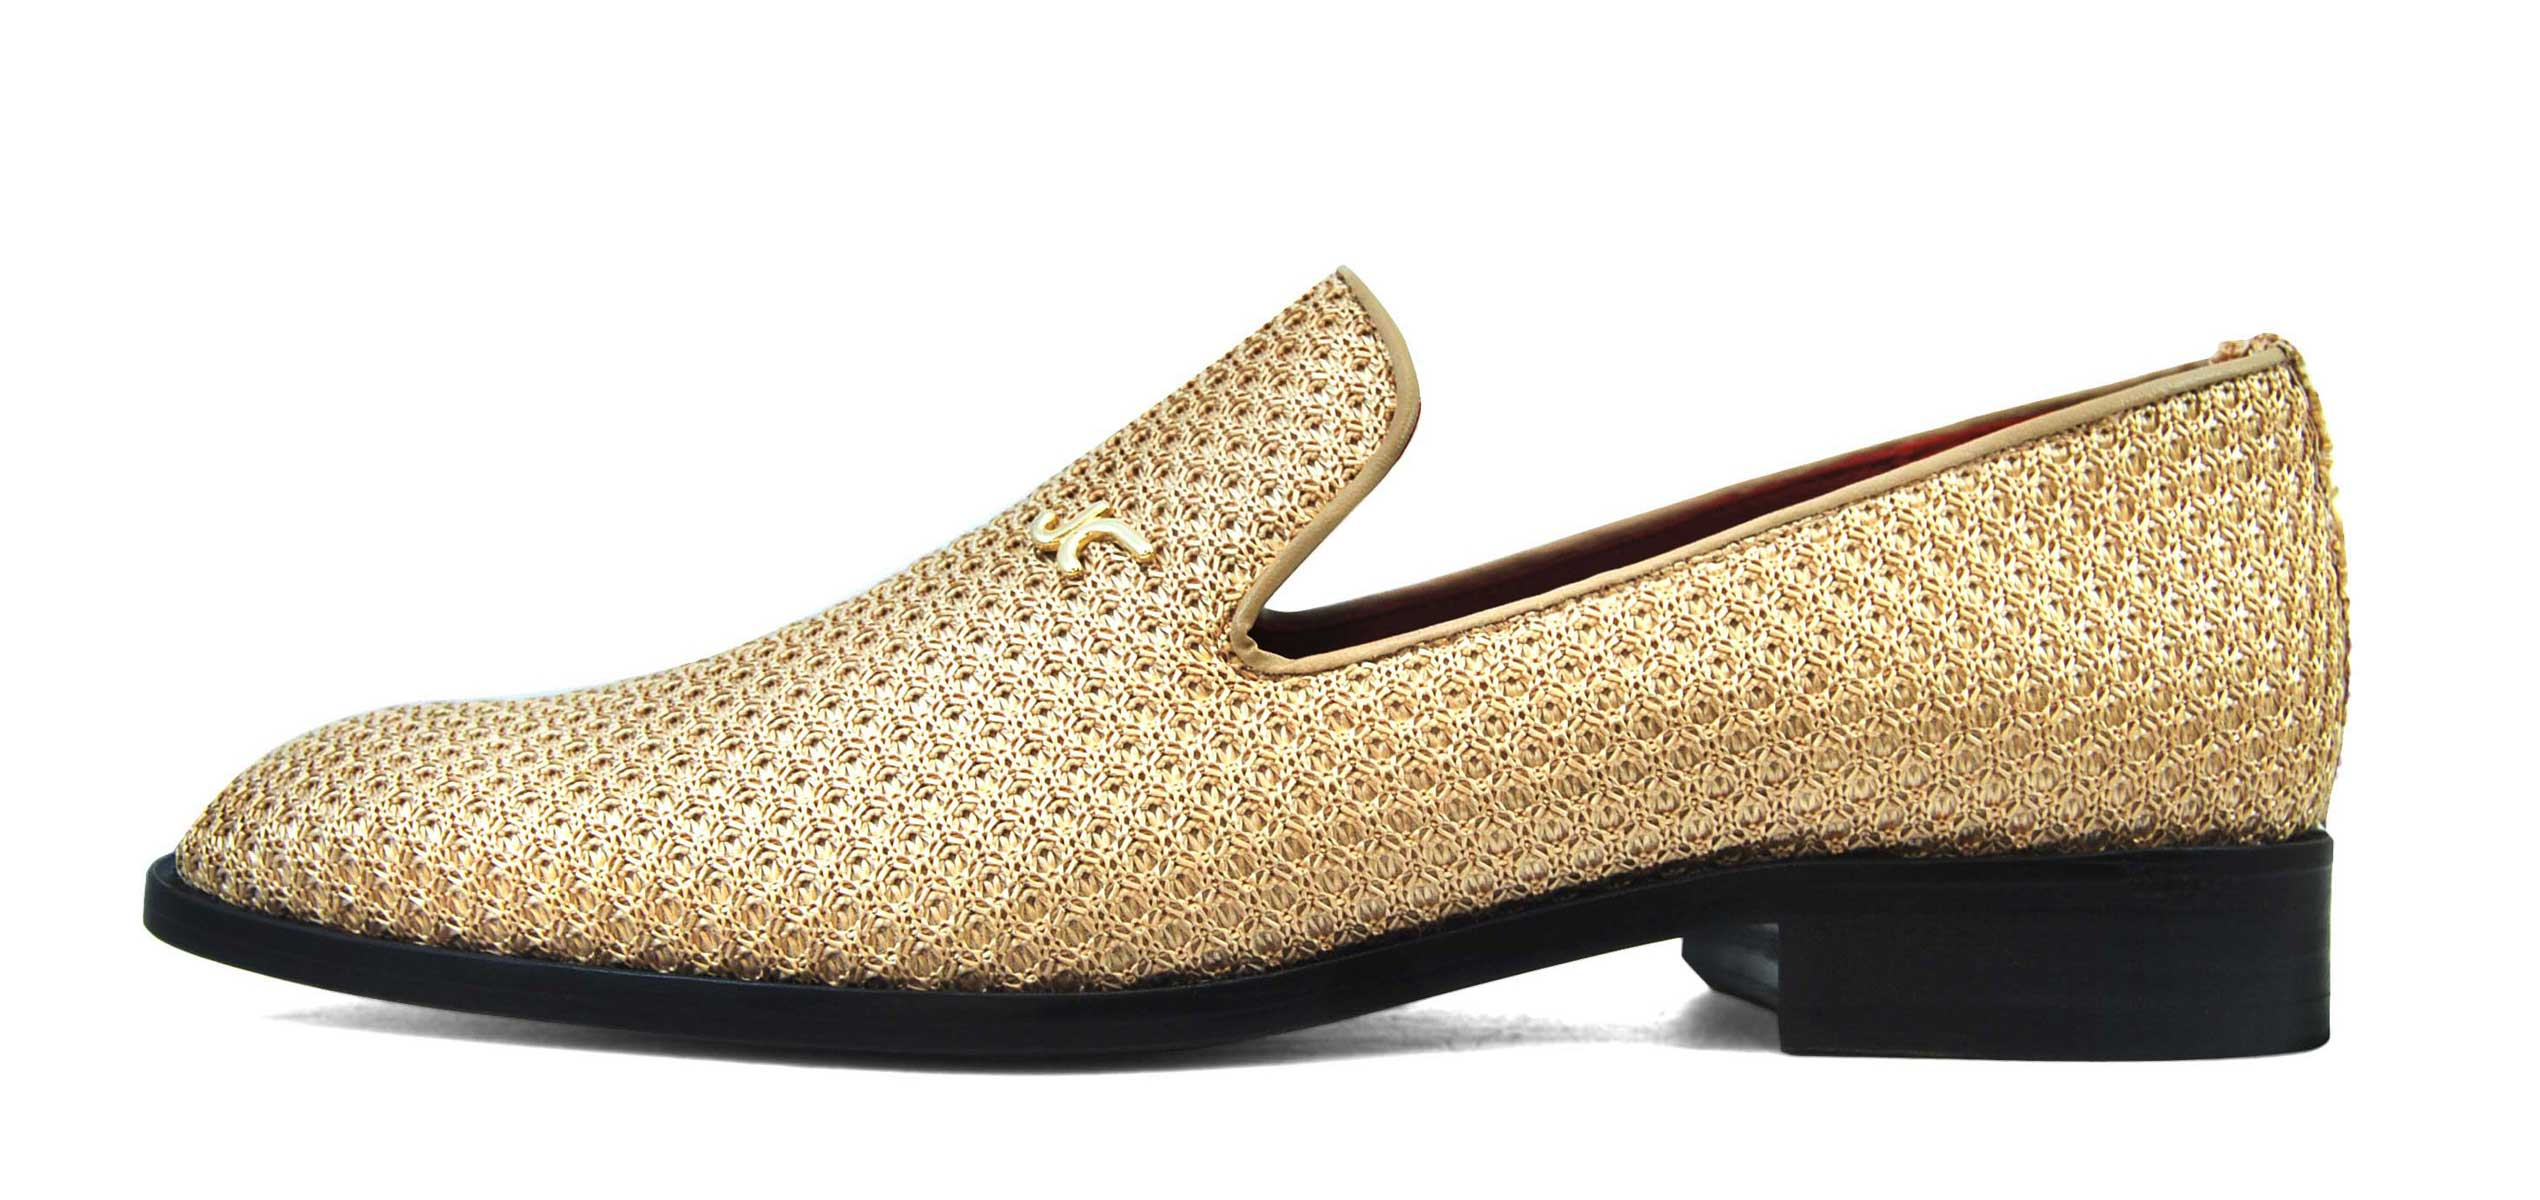 Foto 1 de Zapatos Rafia Trenza Seda Con JC Dorado